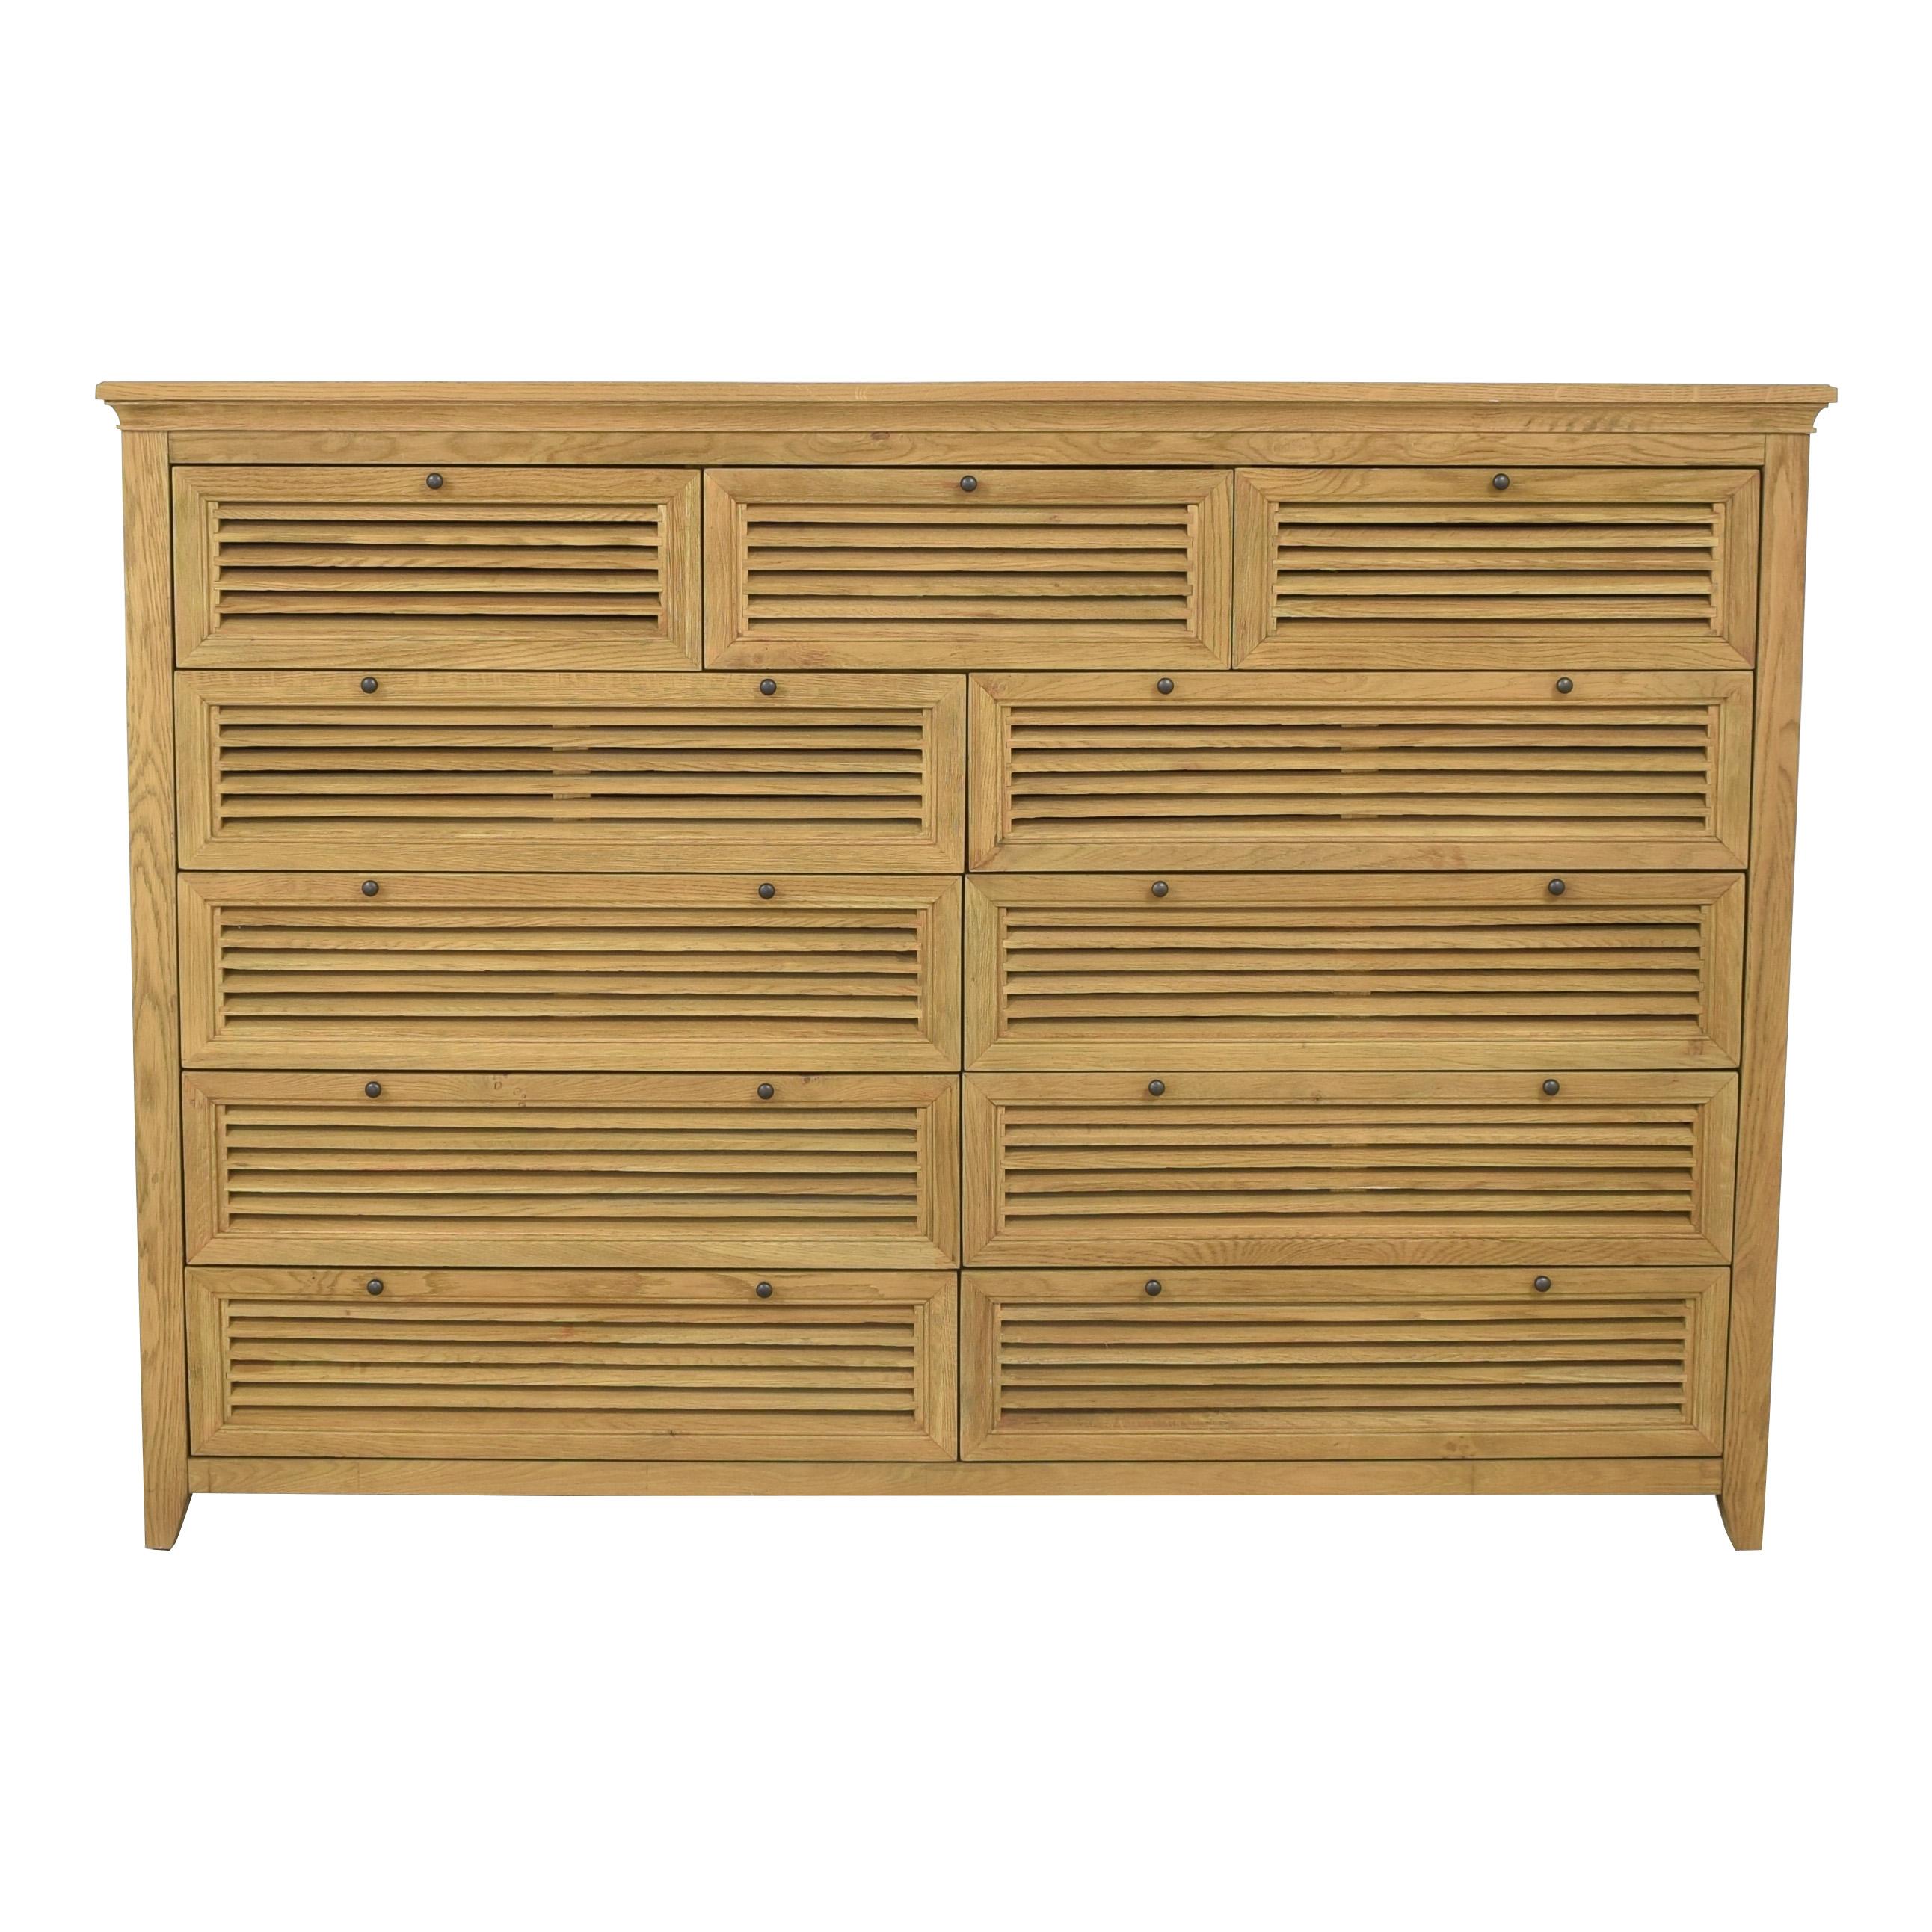 Restoration Hardware Restoration Hardware Shutter 11-Drawer Dresser price